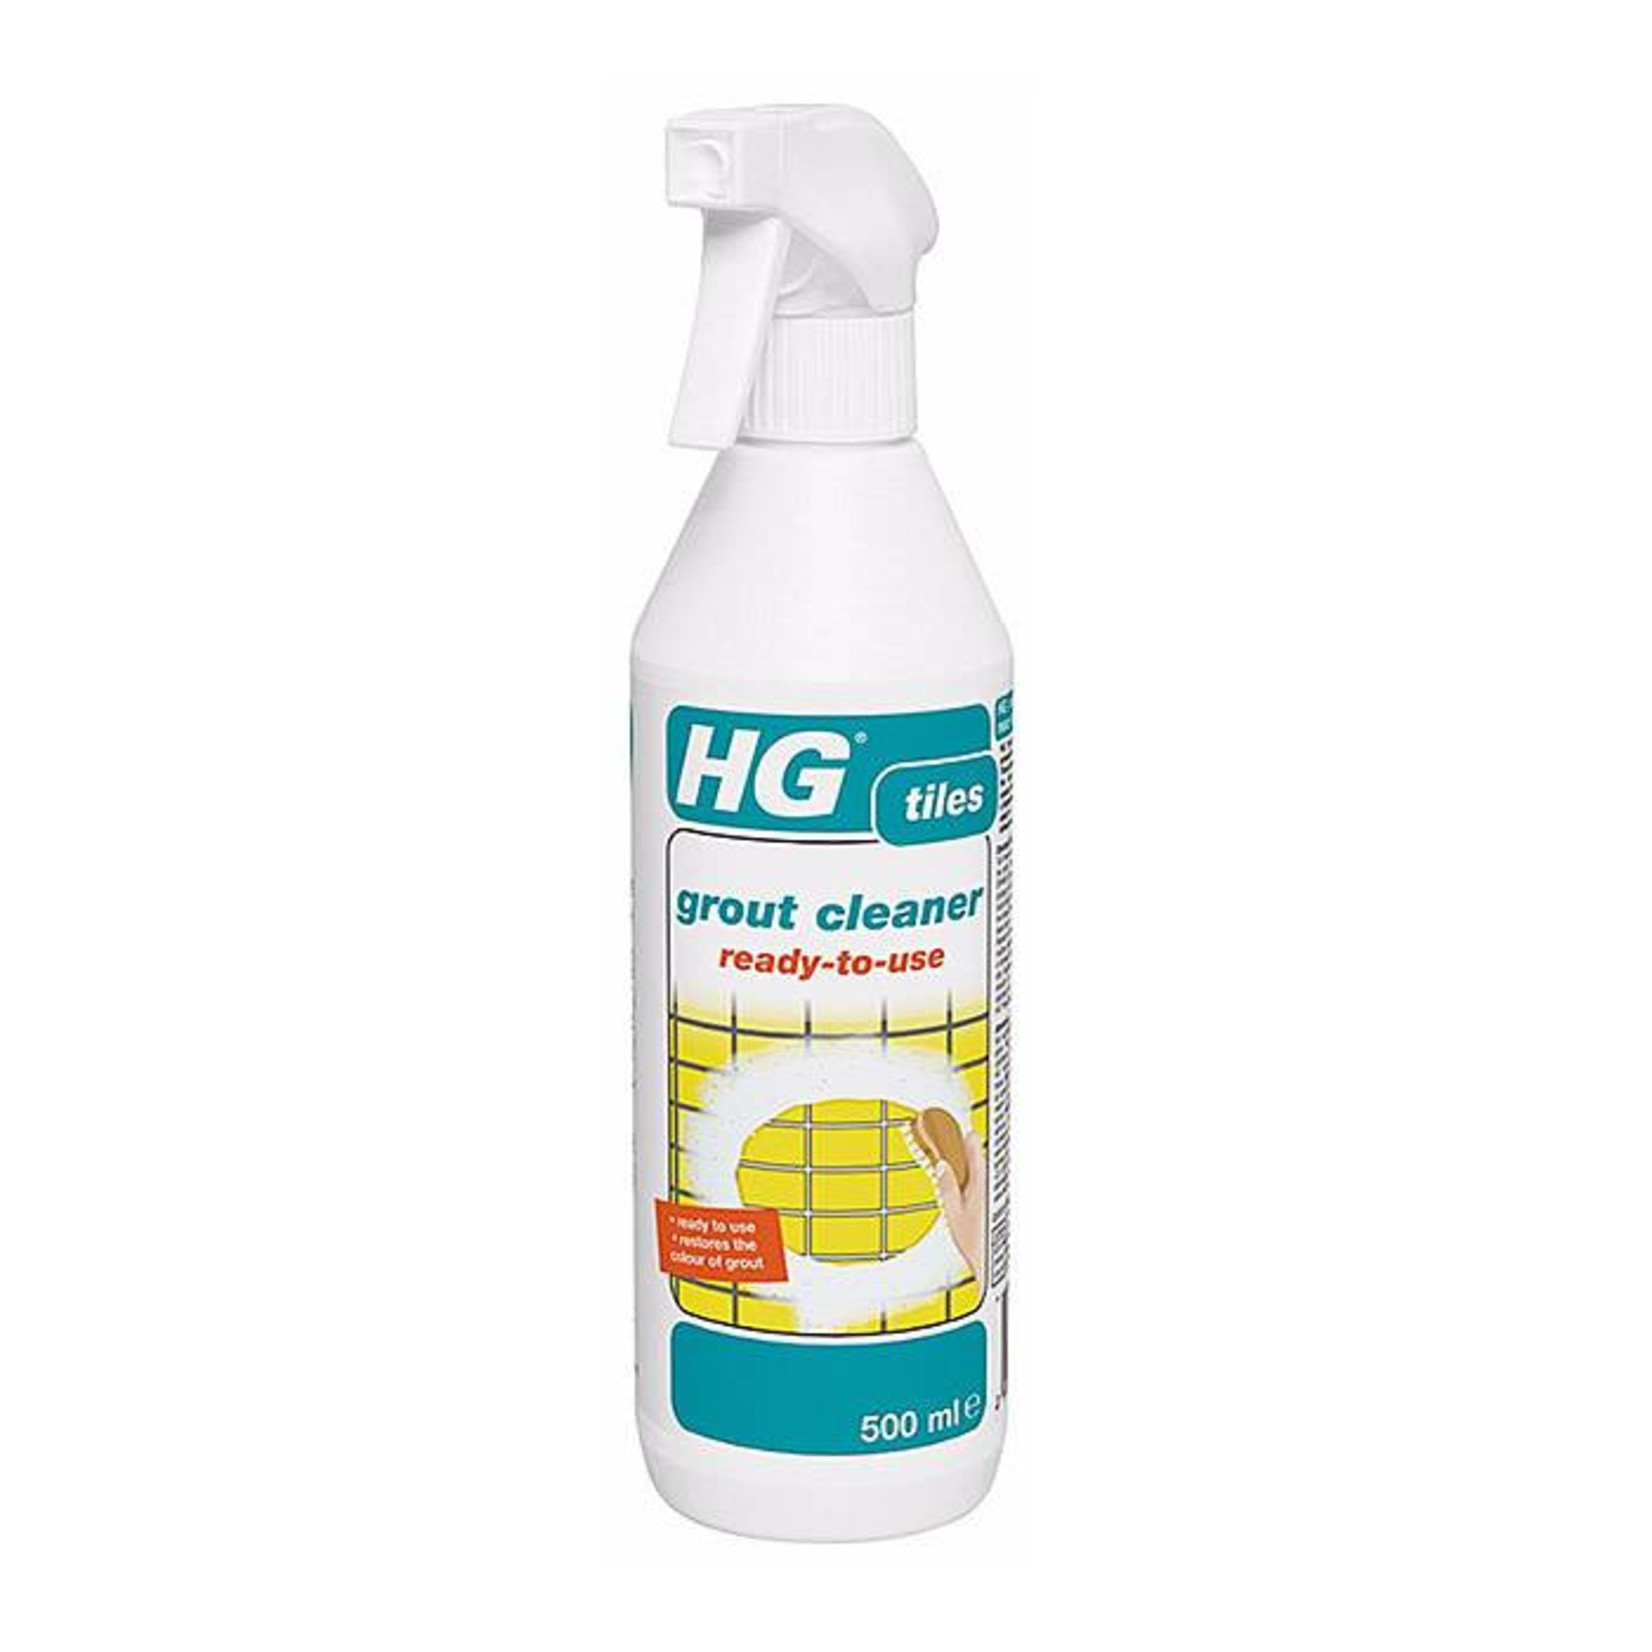 HG HG GROUT CLEANER RTU TILES